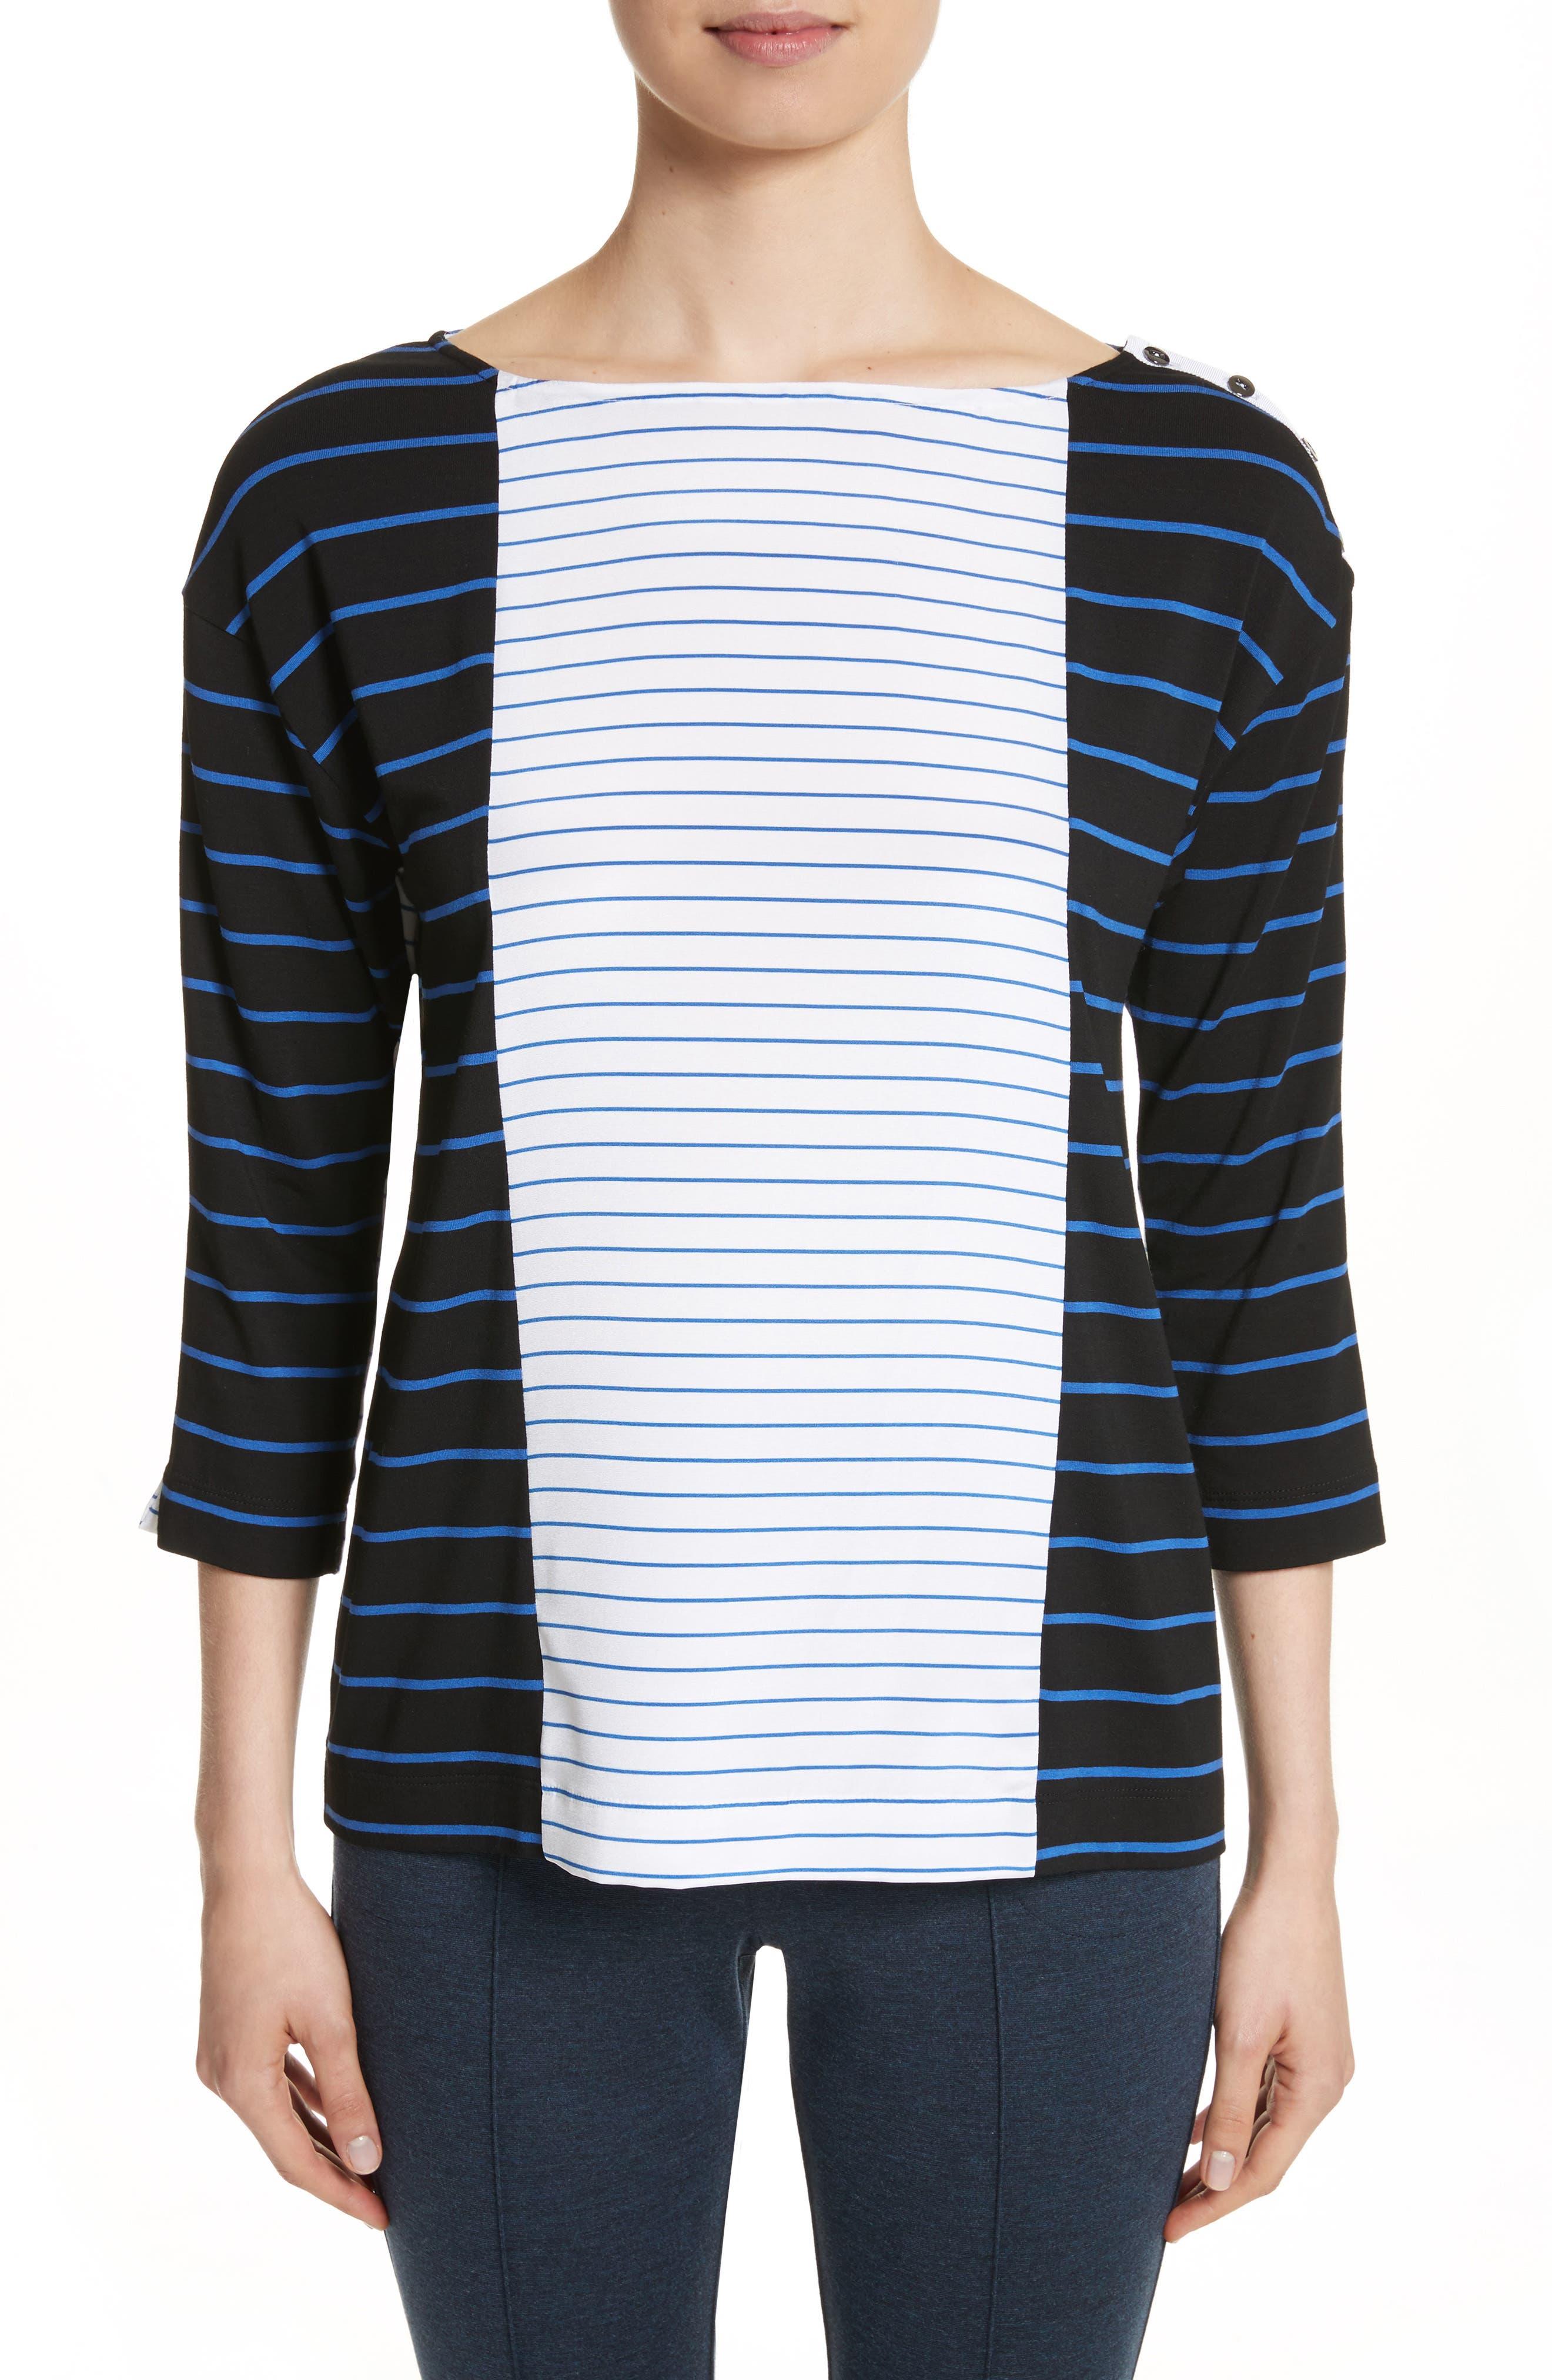 Main Image - St. John Collection Yarn Dyed Stripe Jersey Top